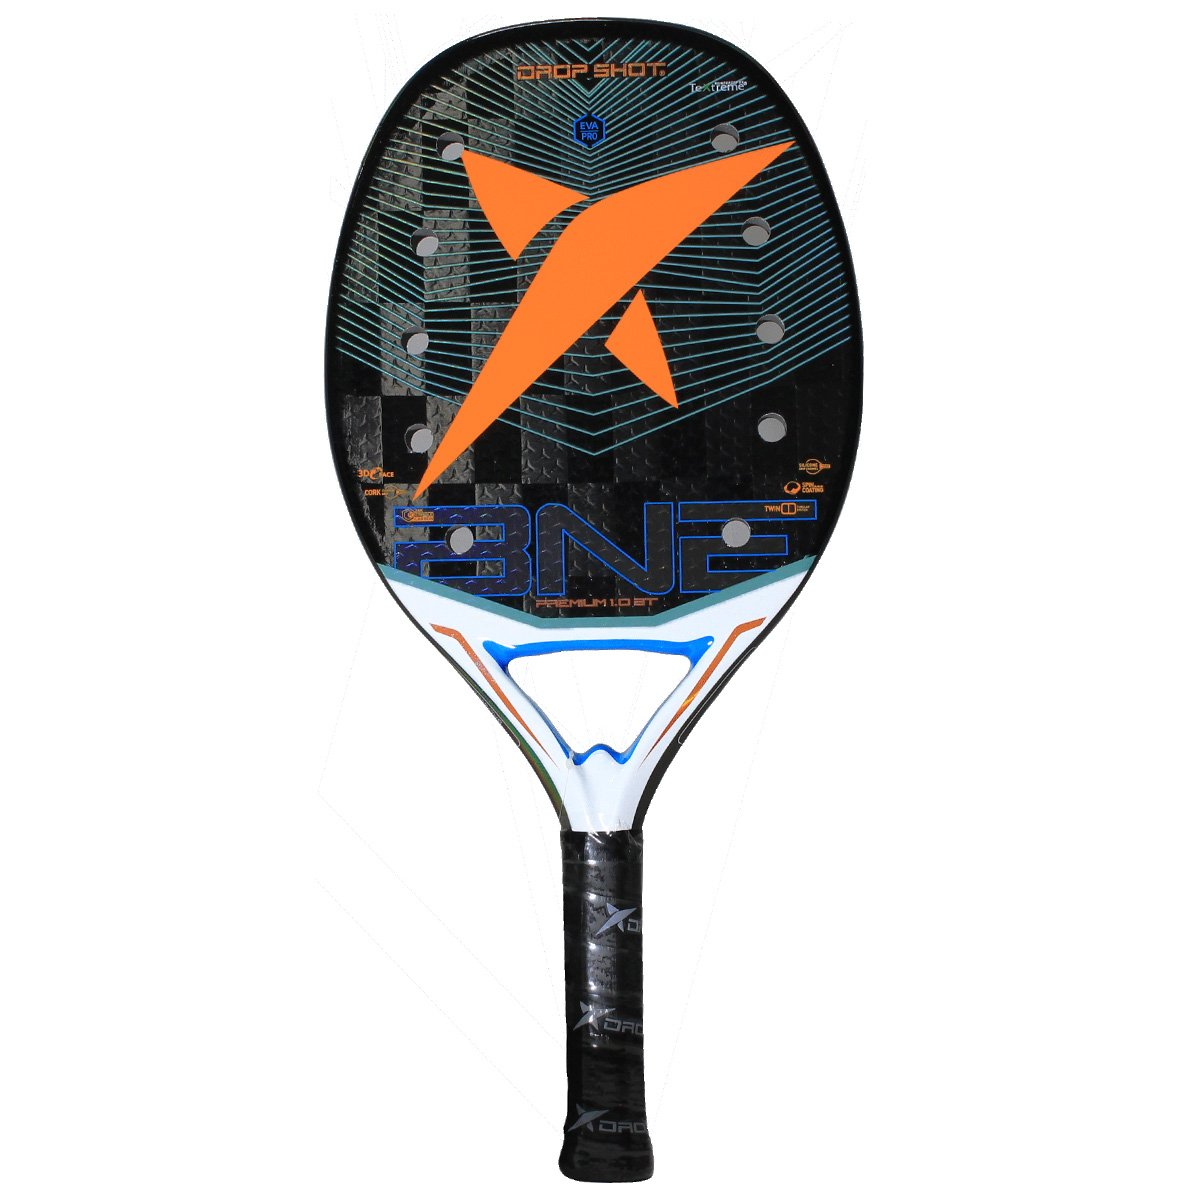 Raquete de beach tennis Drop Shot Premium 1.0